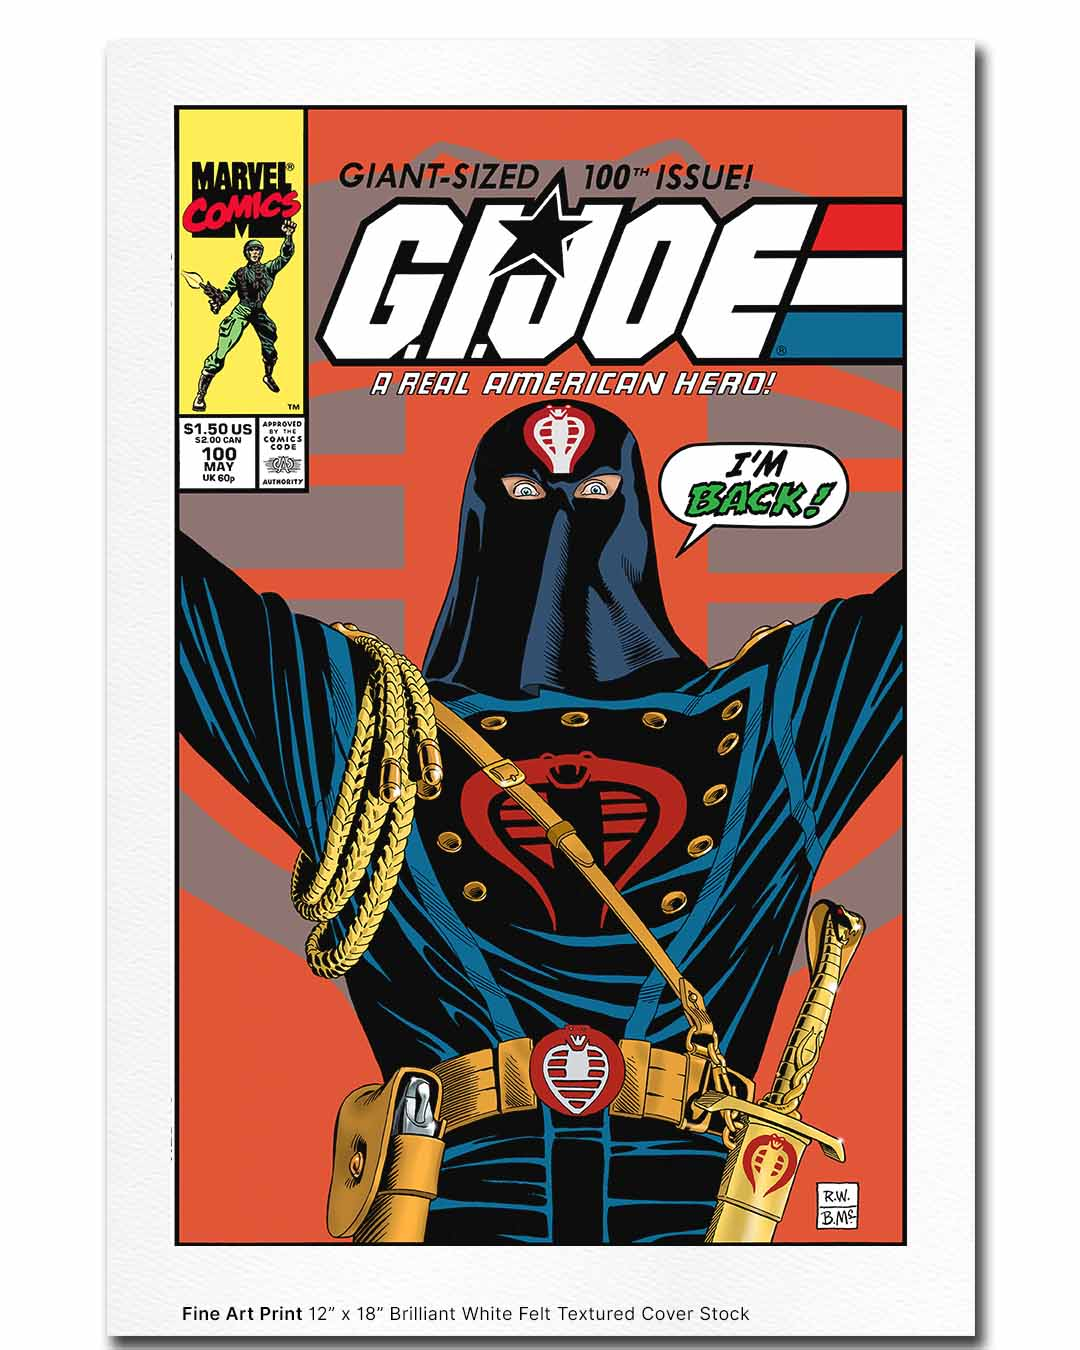 G.I. JOE #100: SEEDS OF EMPIRE